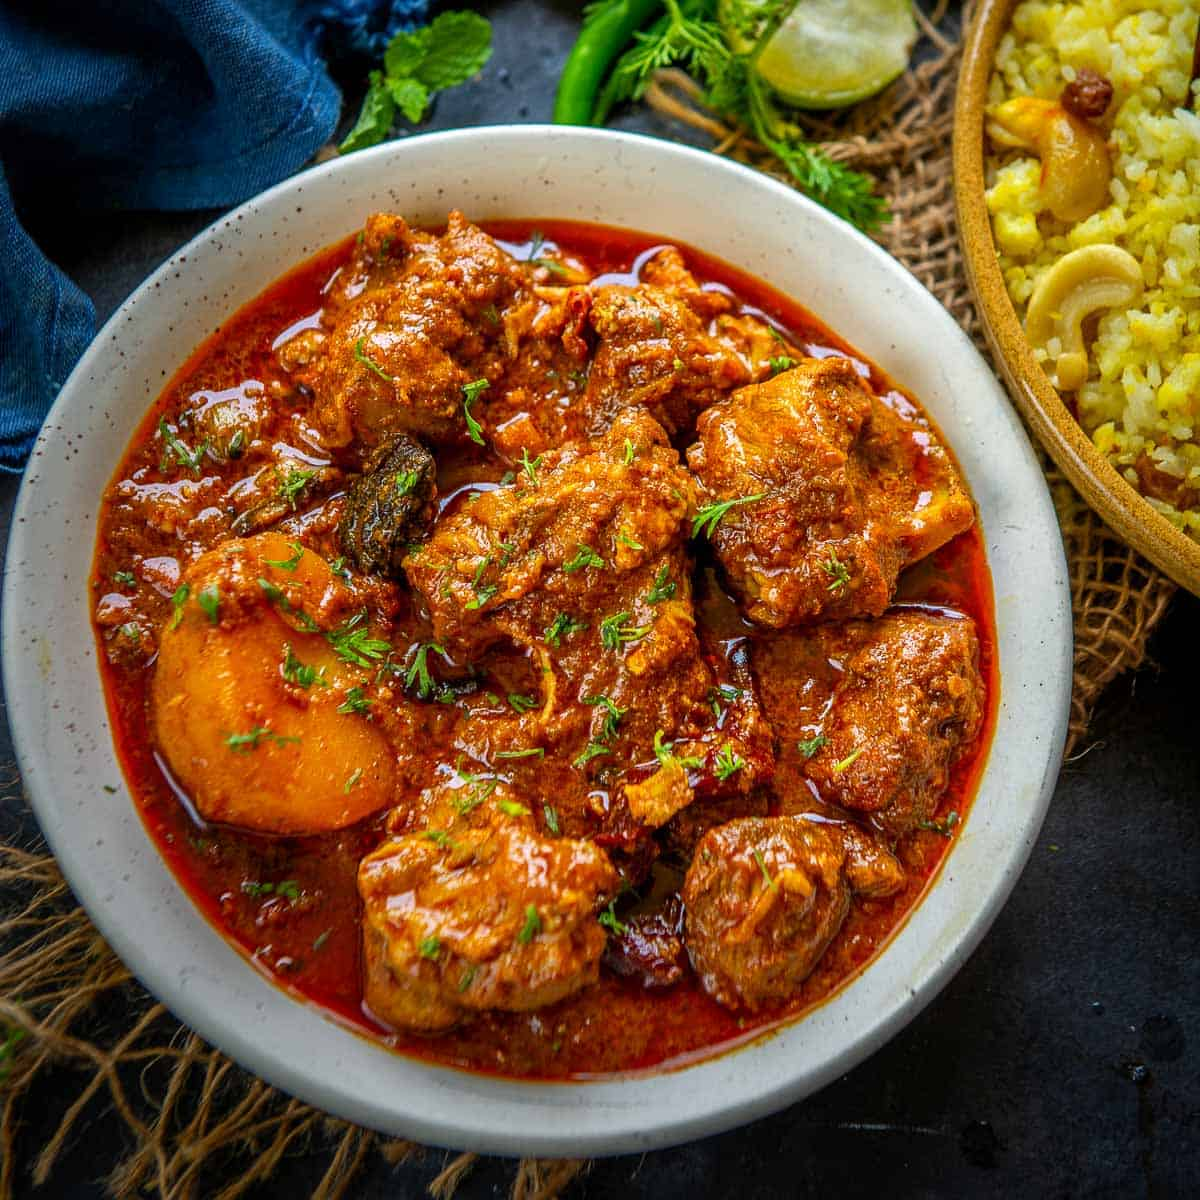 Kosha Mangsho Recipe (Bengali Mutton Curry) + Video - Whiskaffair